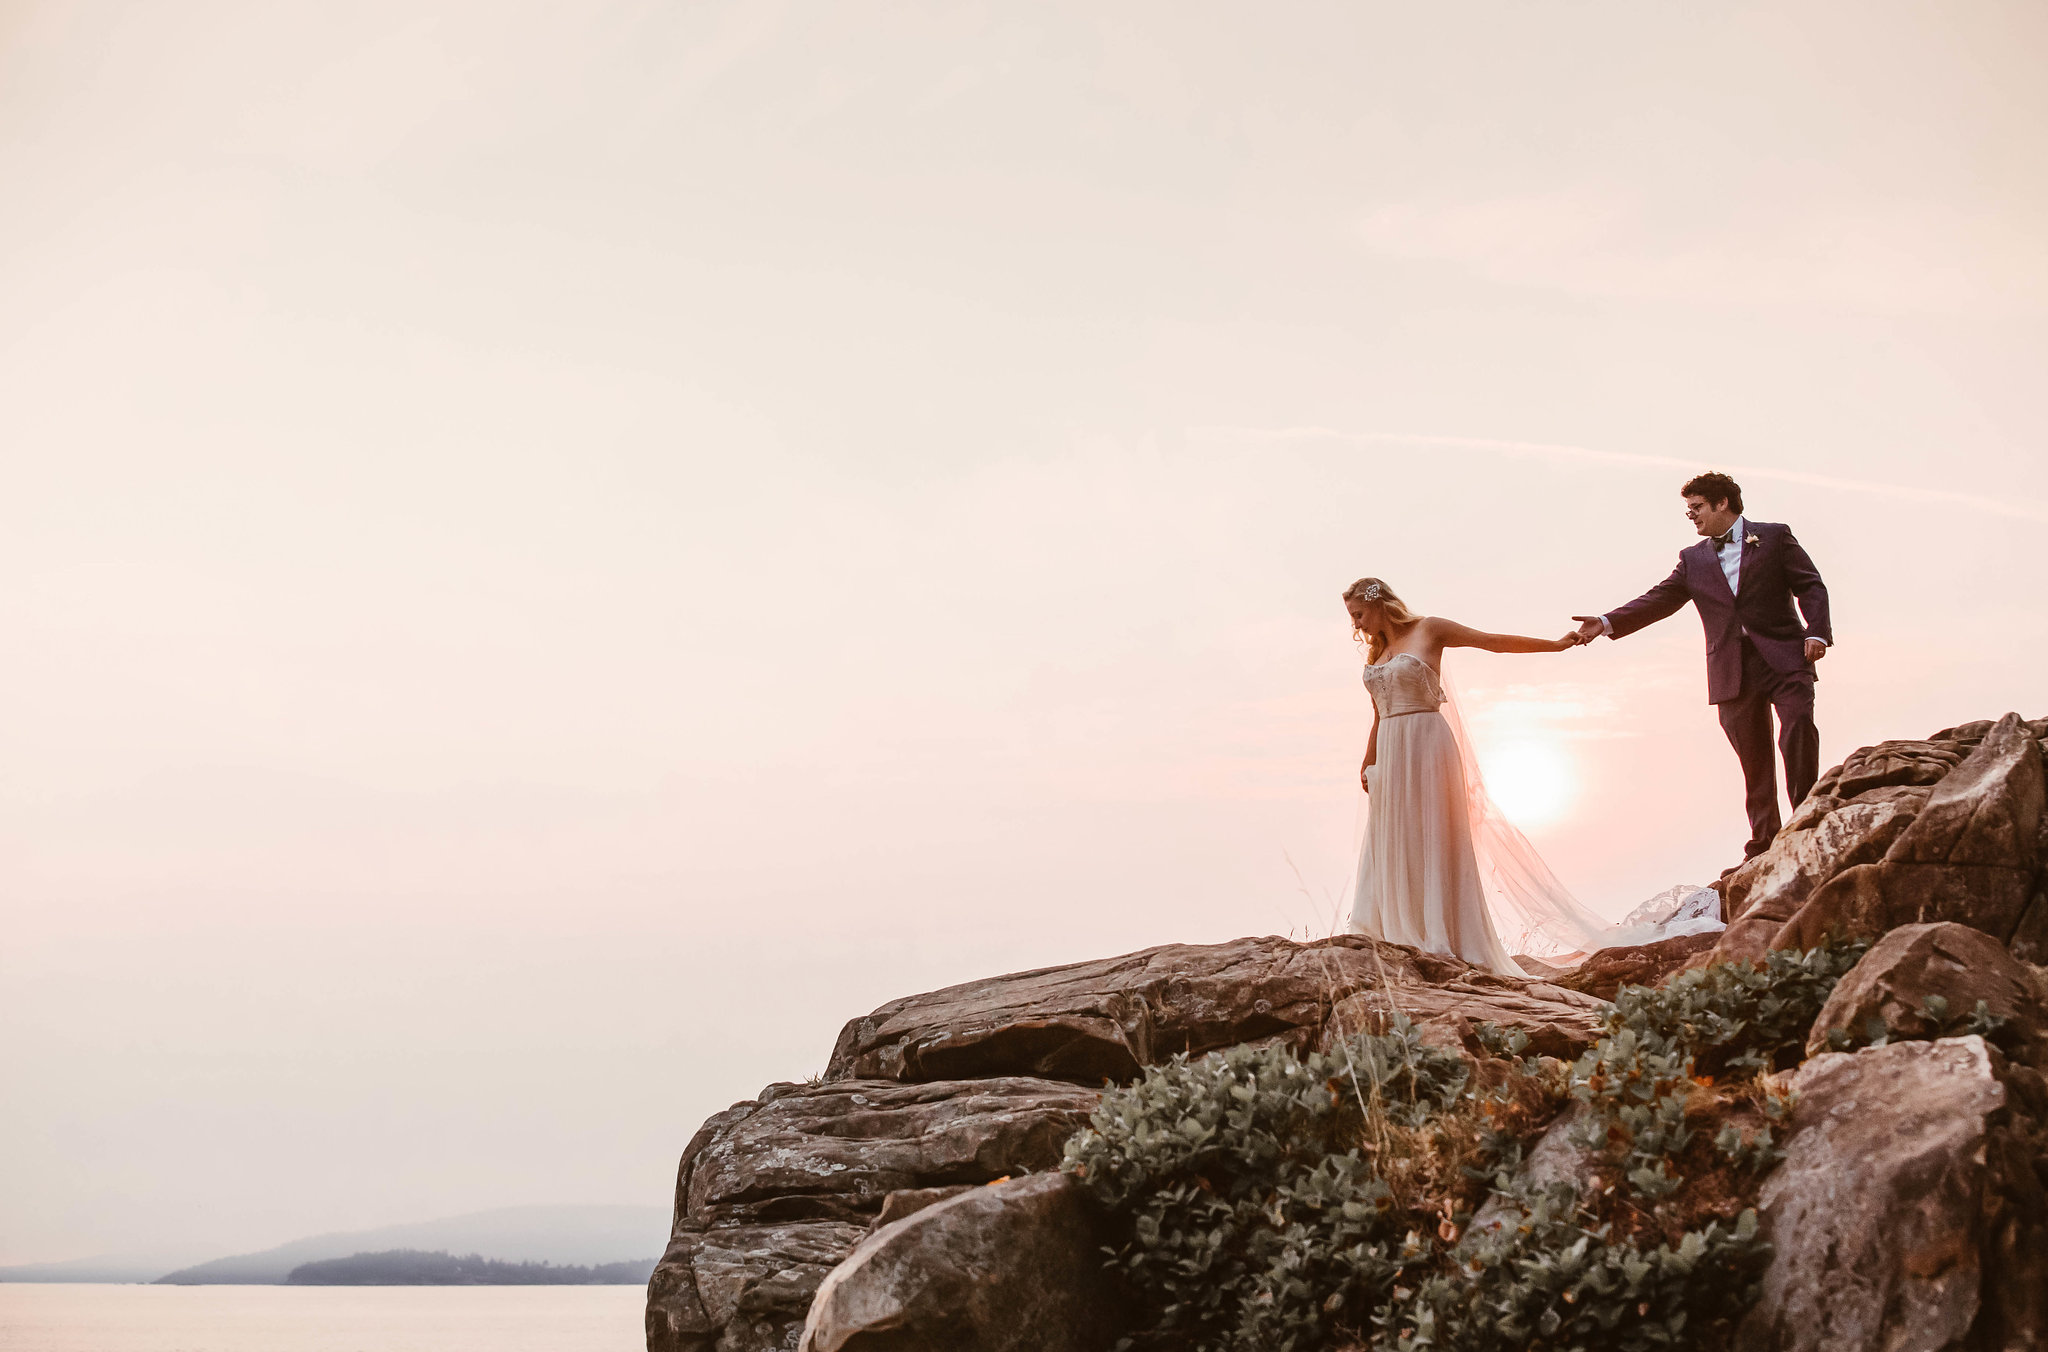 bellingham-wedding-backayard-by-seattle-wedding-photographer-adina-preston-1.jpg